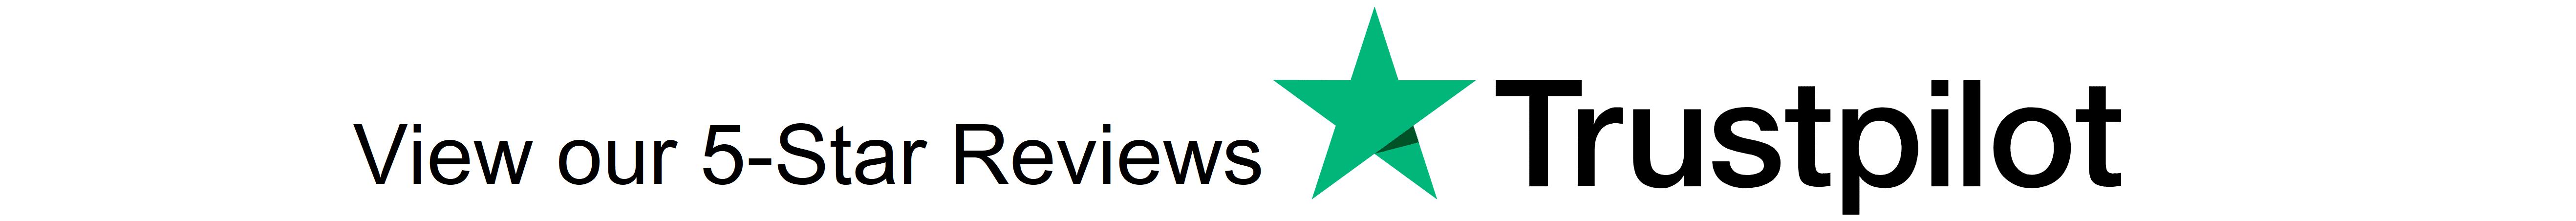 trustpilot link logo